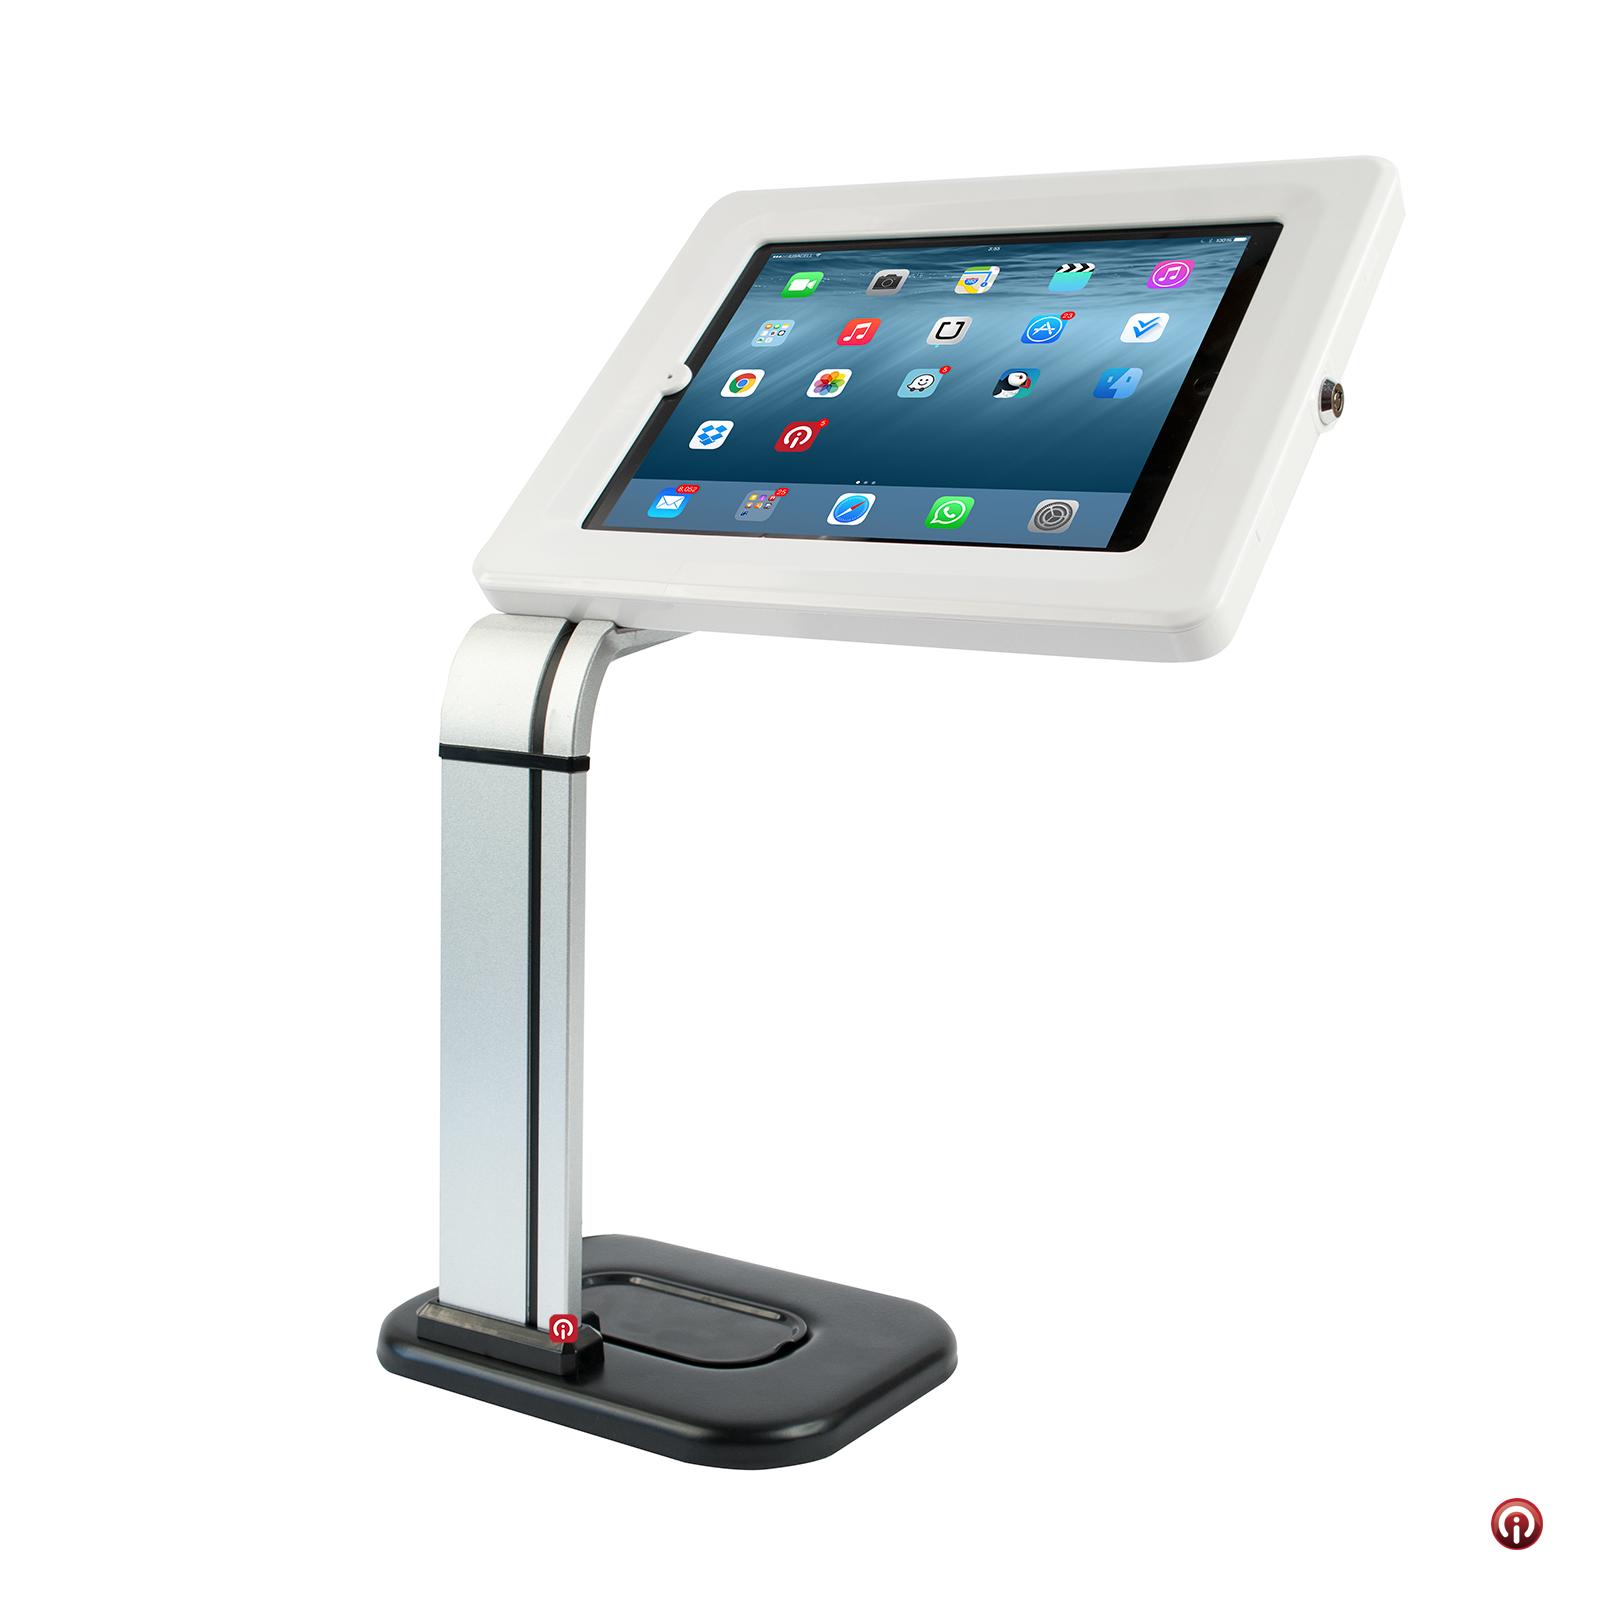 Tsclk14 soporte base kiosko pedestal universal seguridad antirrobo para ipad y tablets de 9 a 11 - Soporte para tablet ...